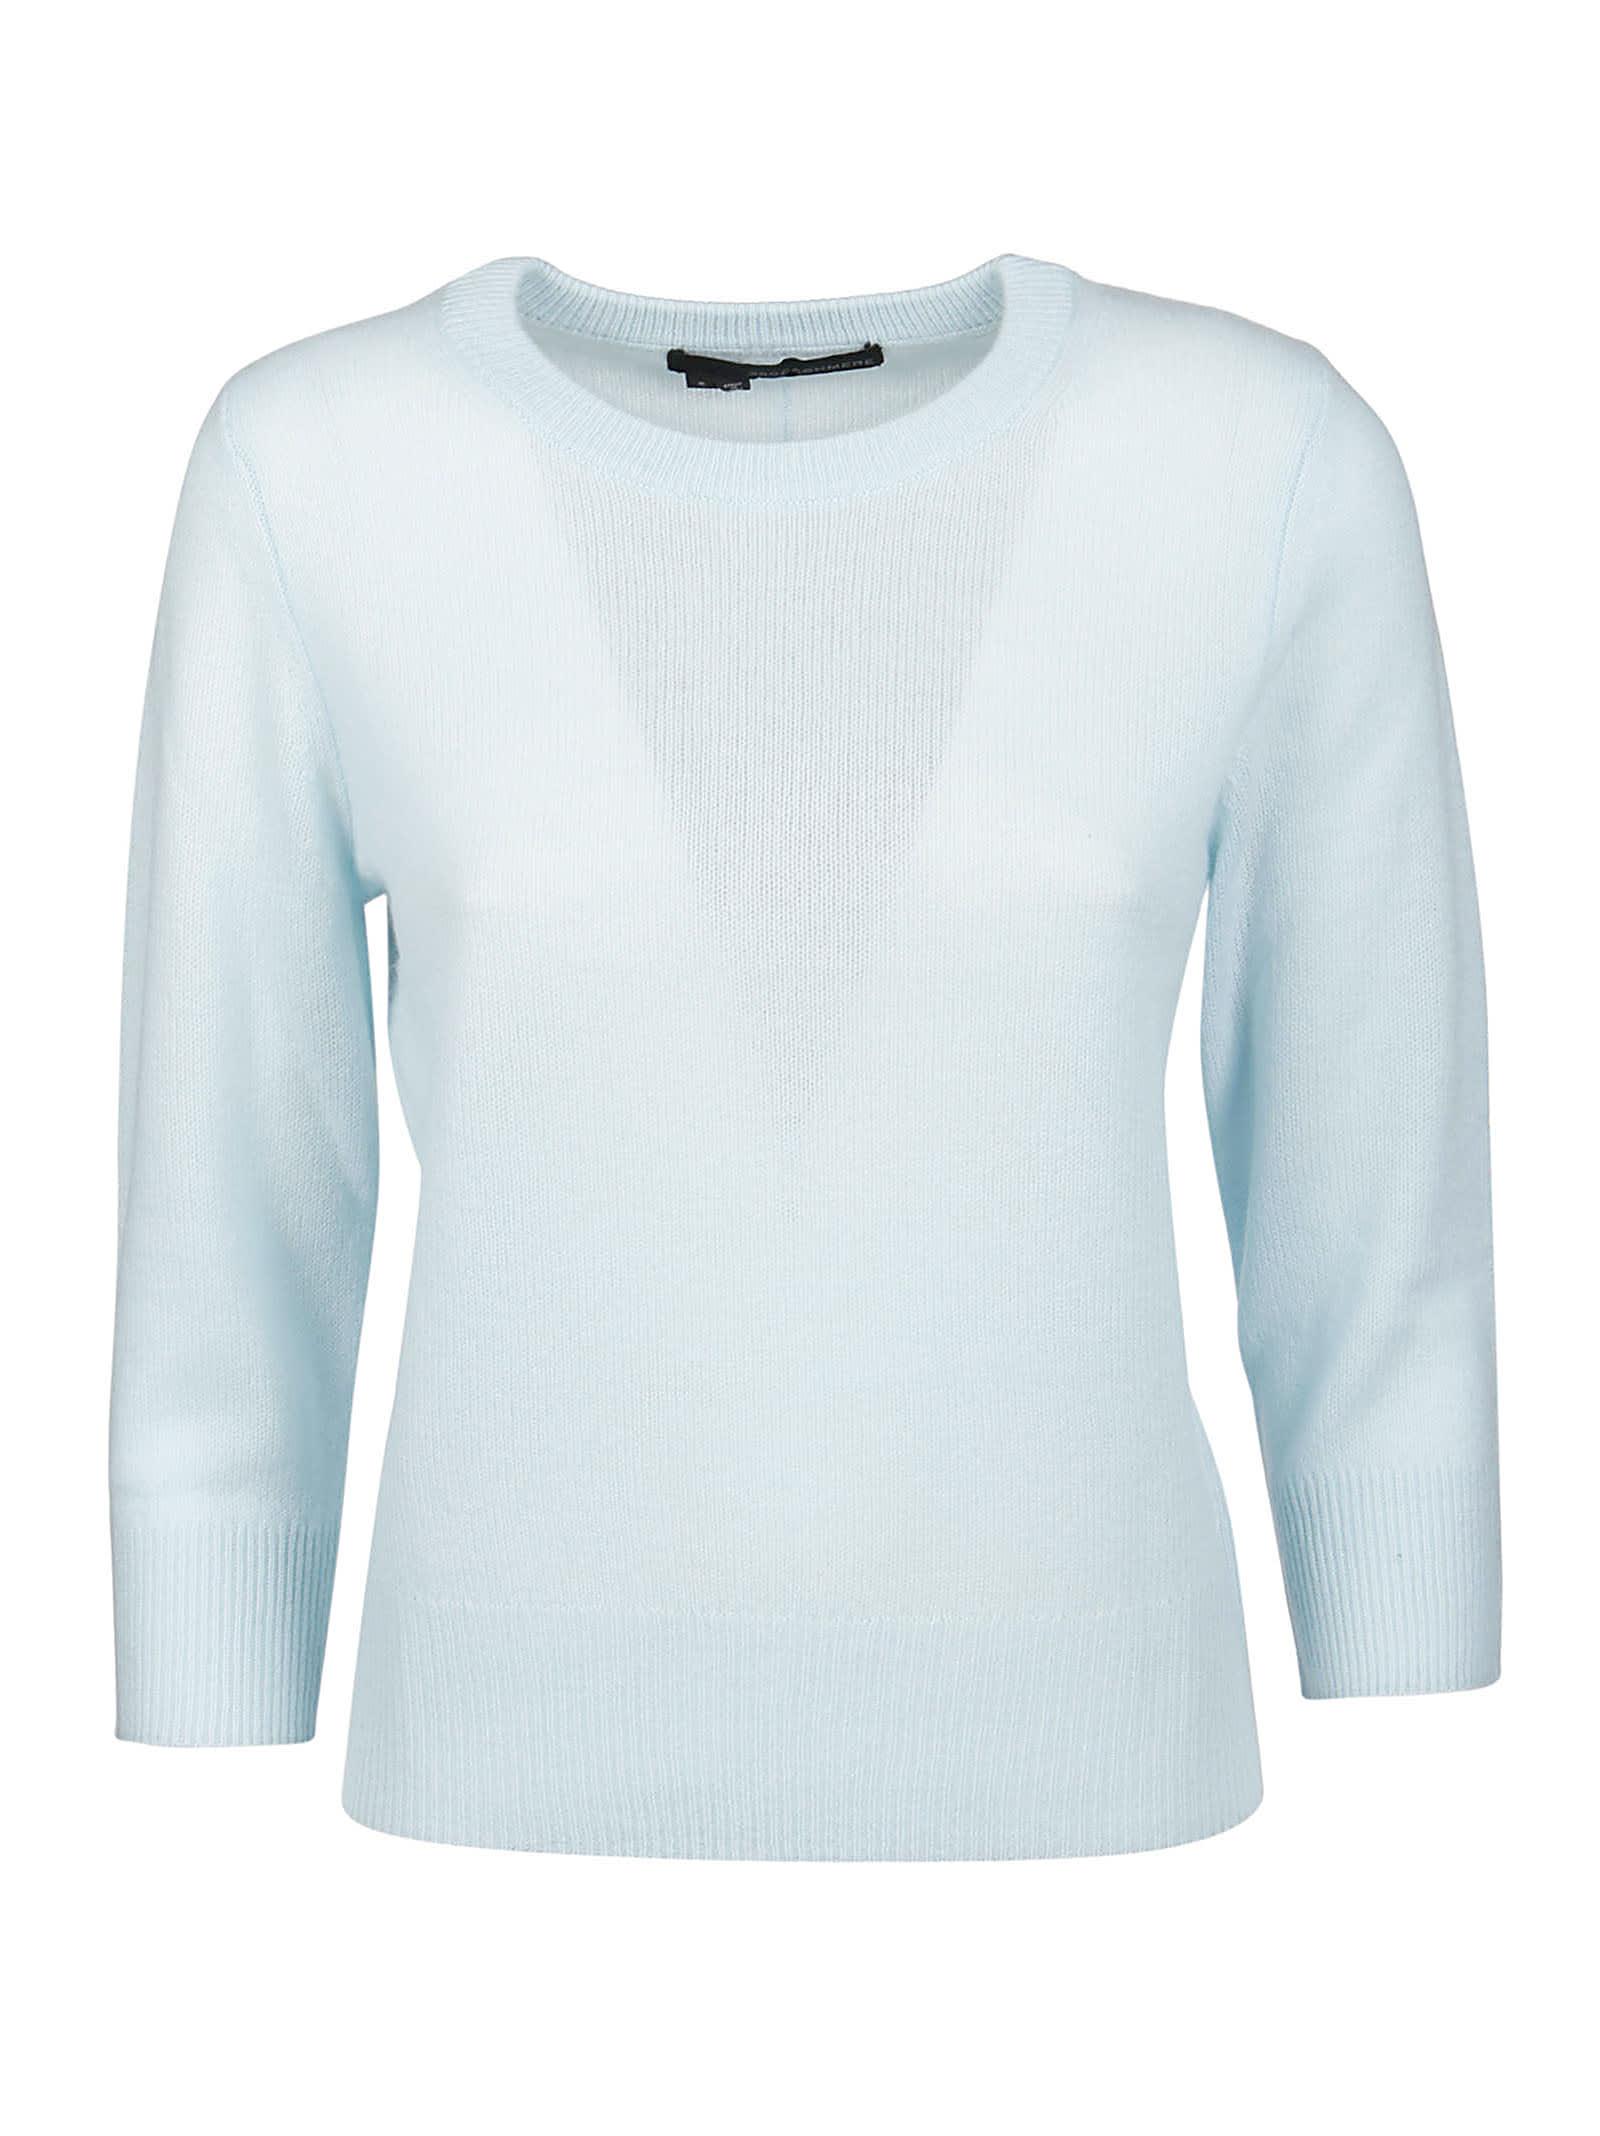 360 Sweater SWEATER DENISE